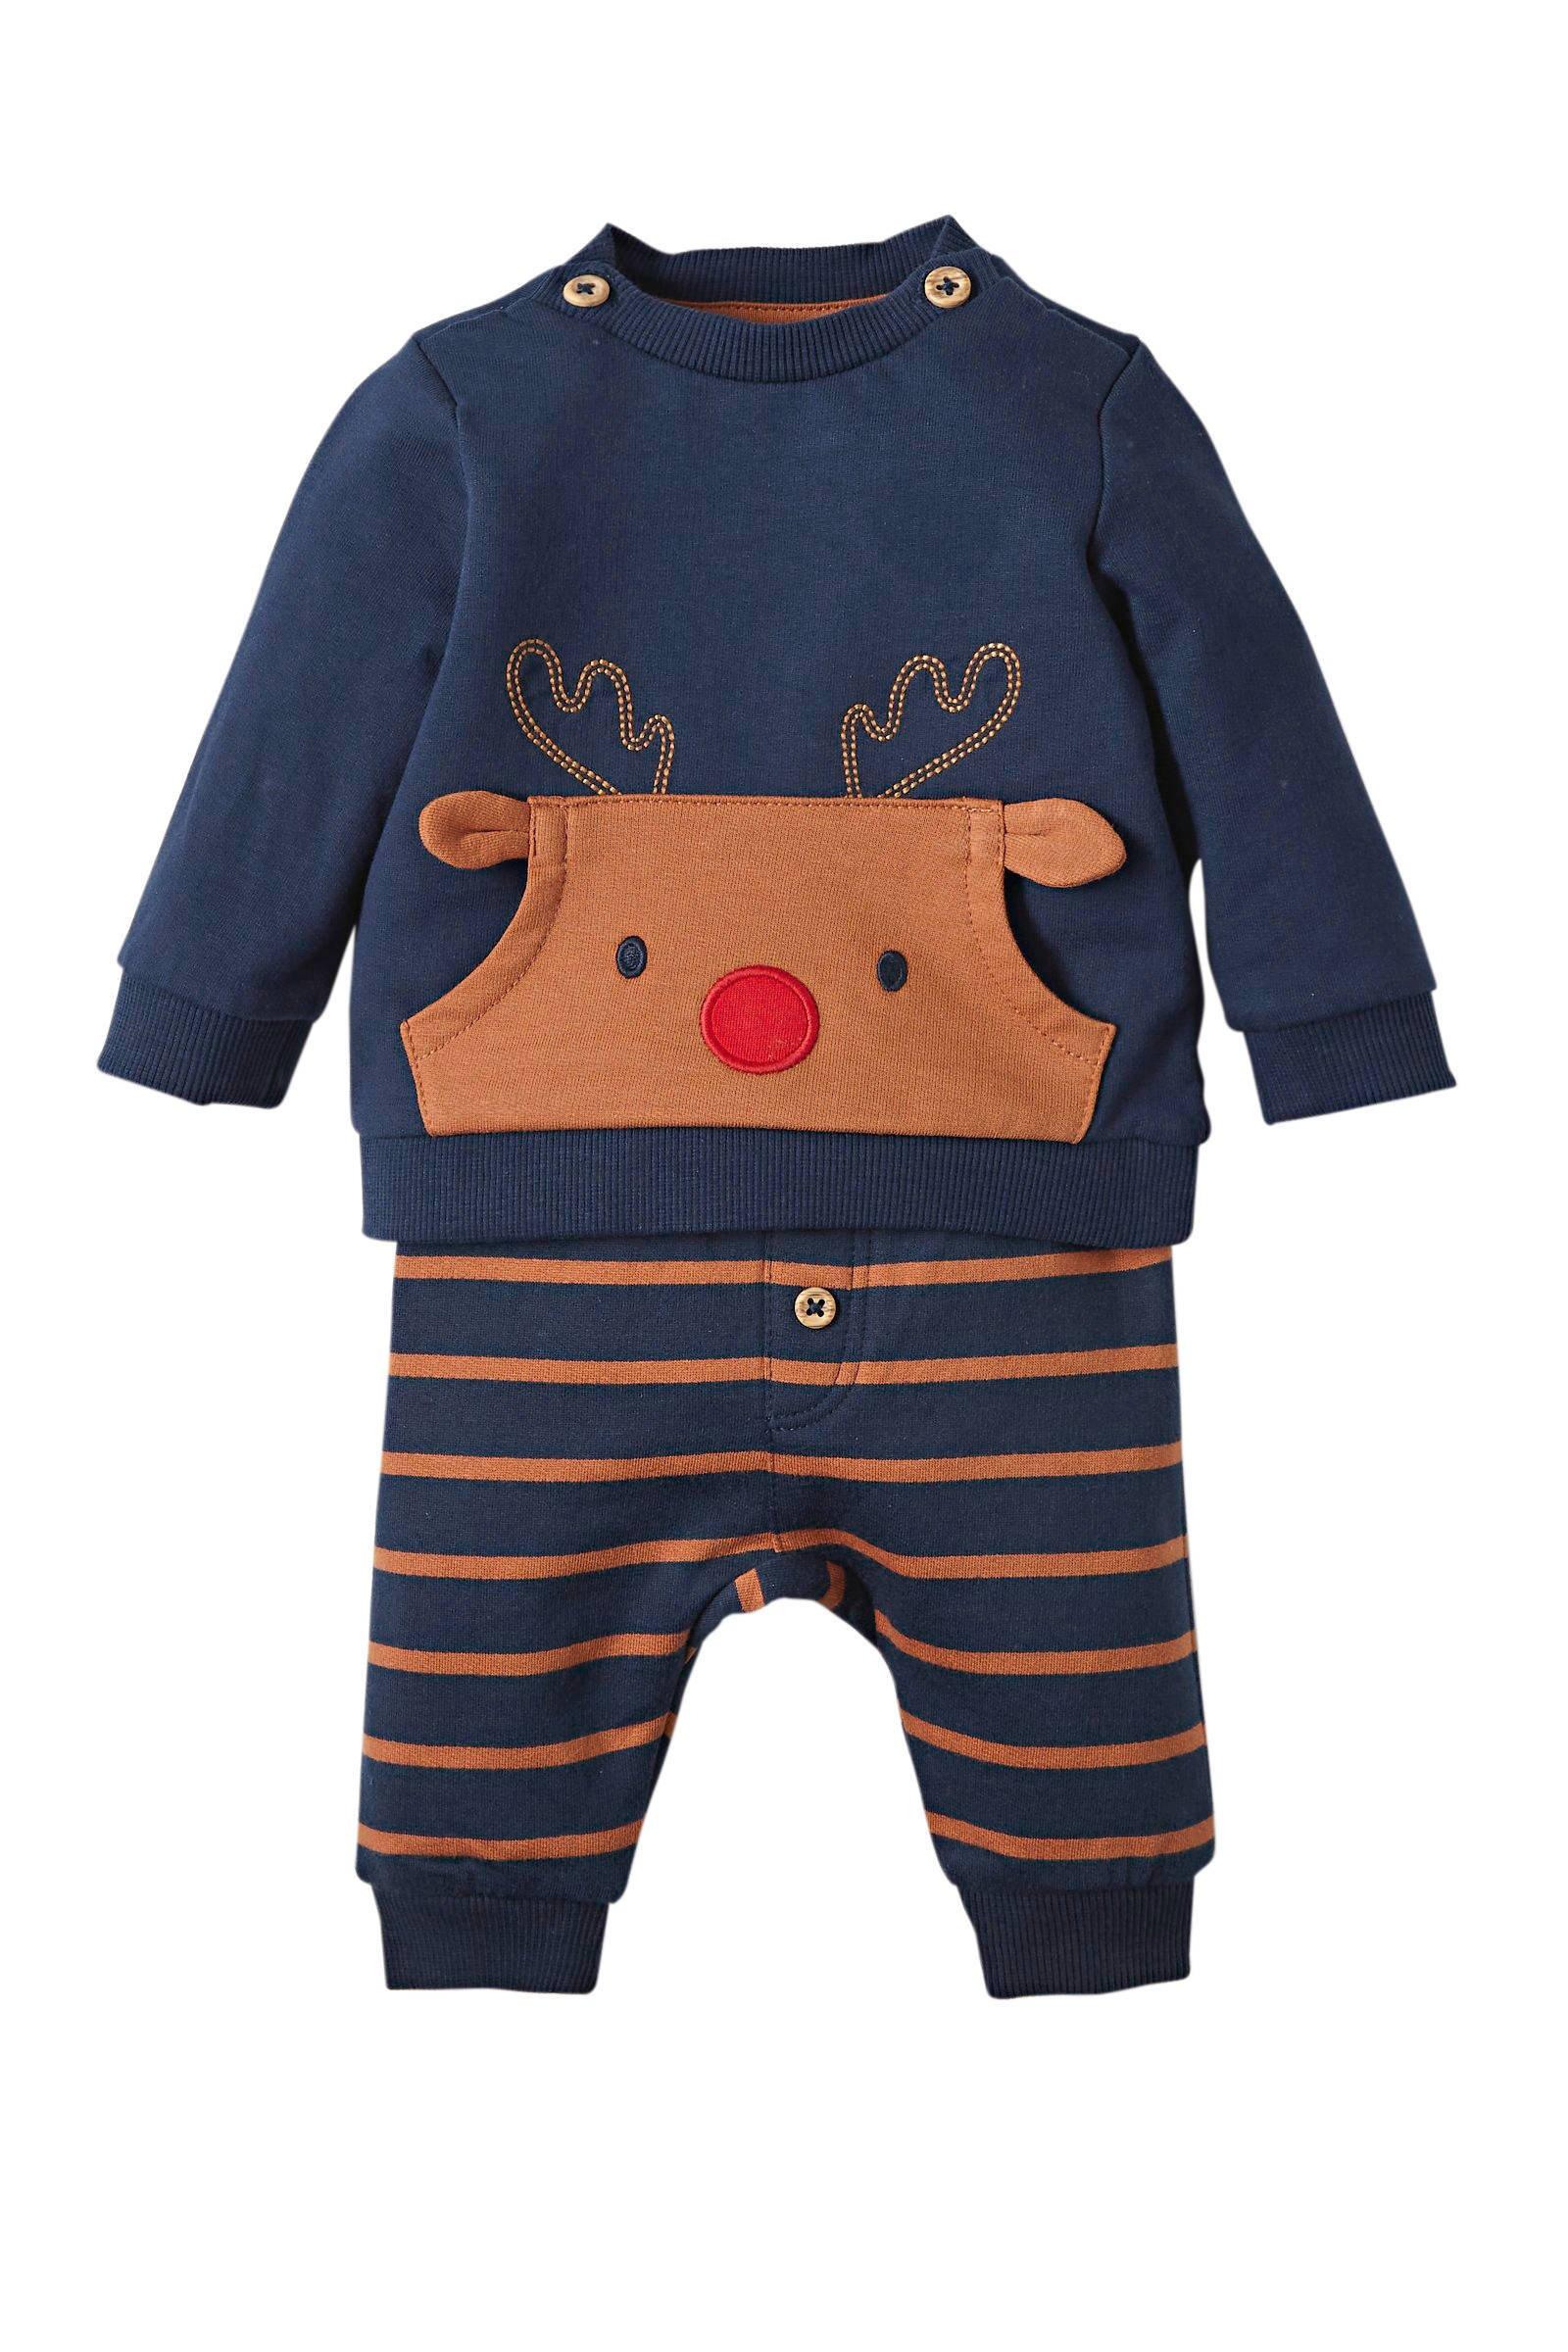 C&A Baby Club sweater set van 2 roodwitdonkerblauw   wehkamp